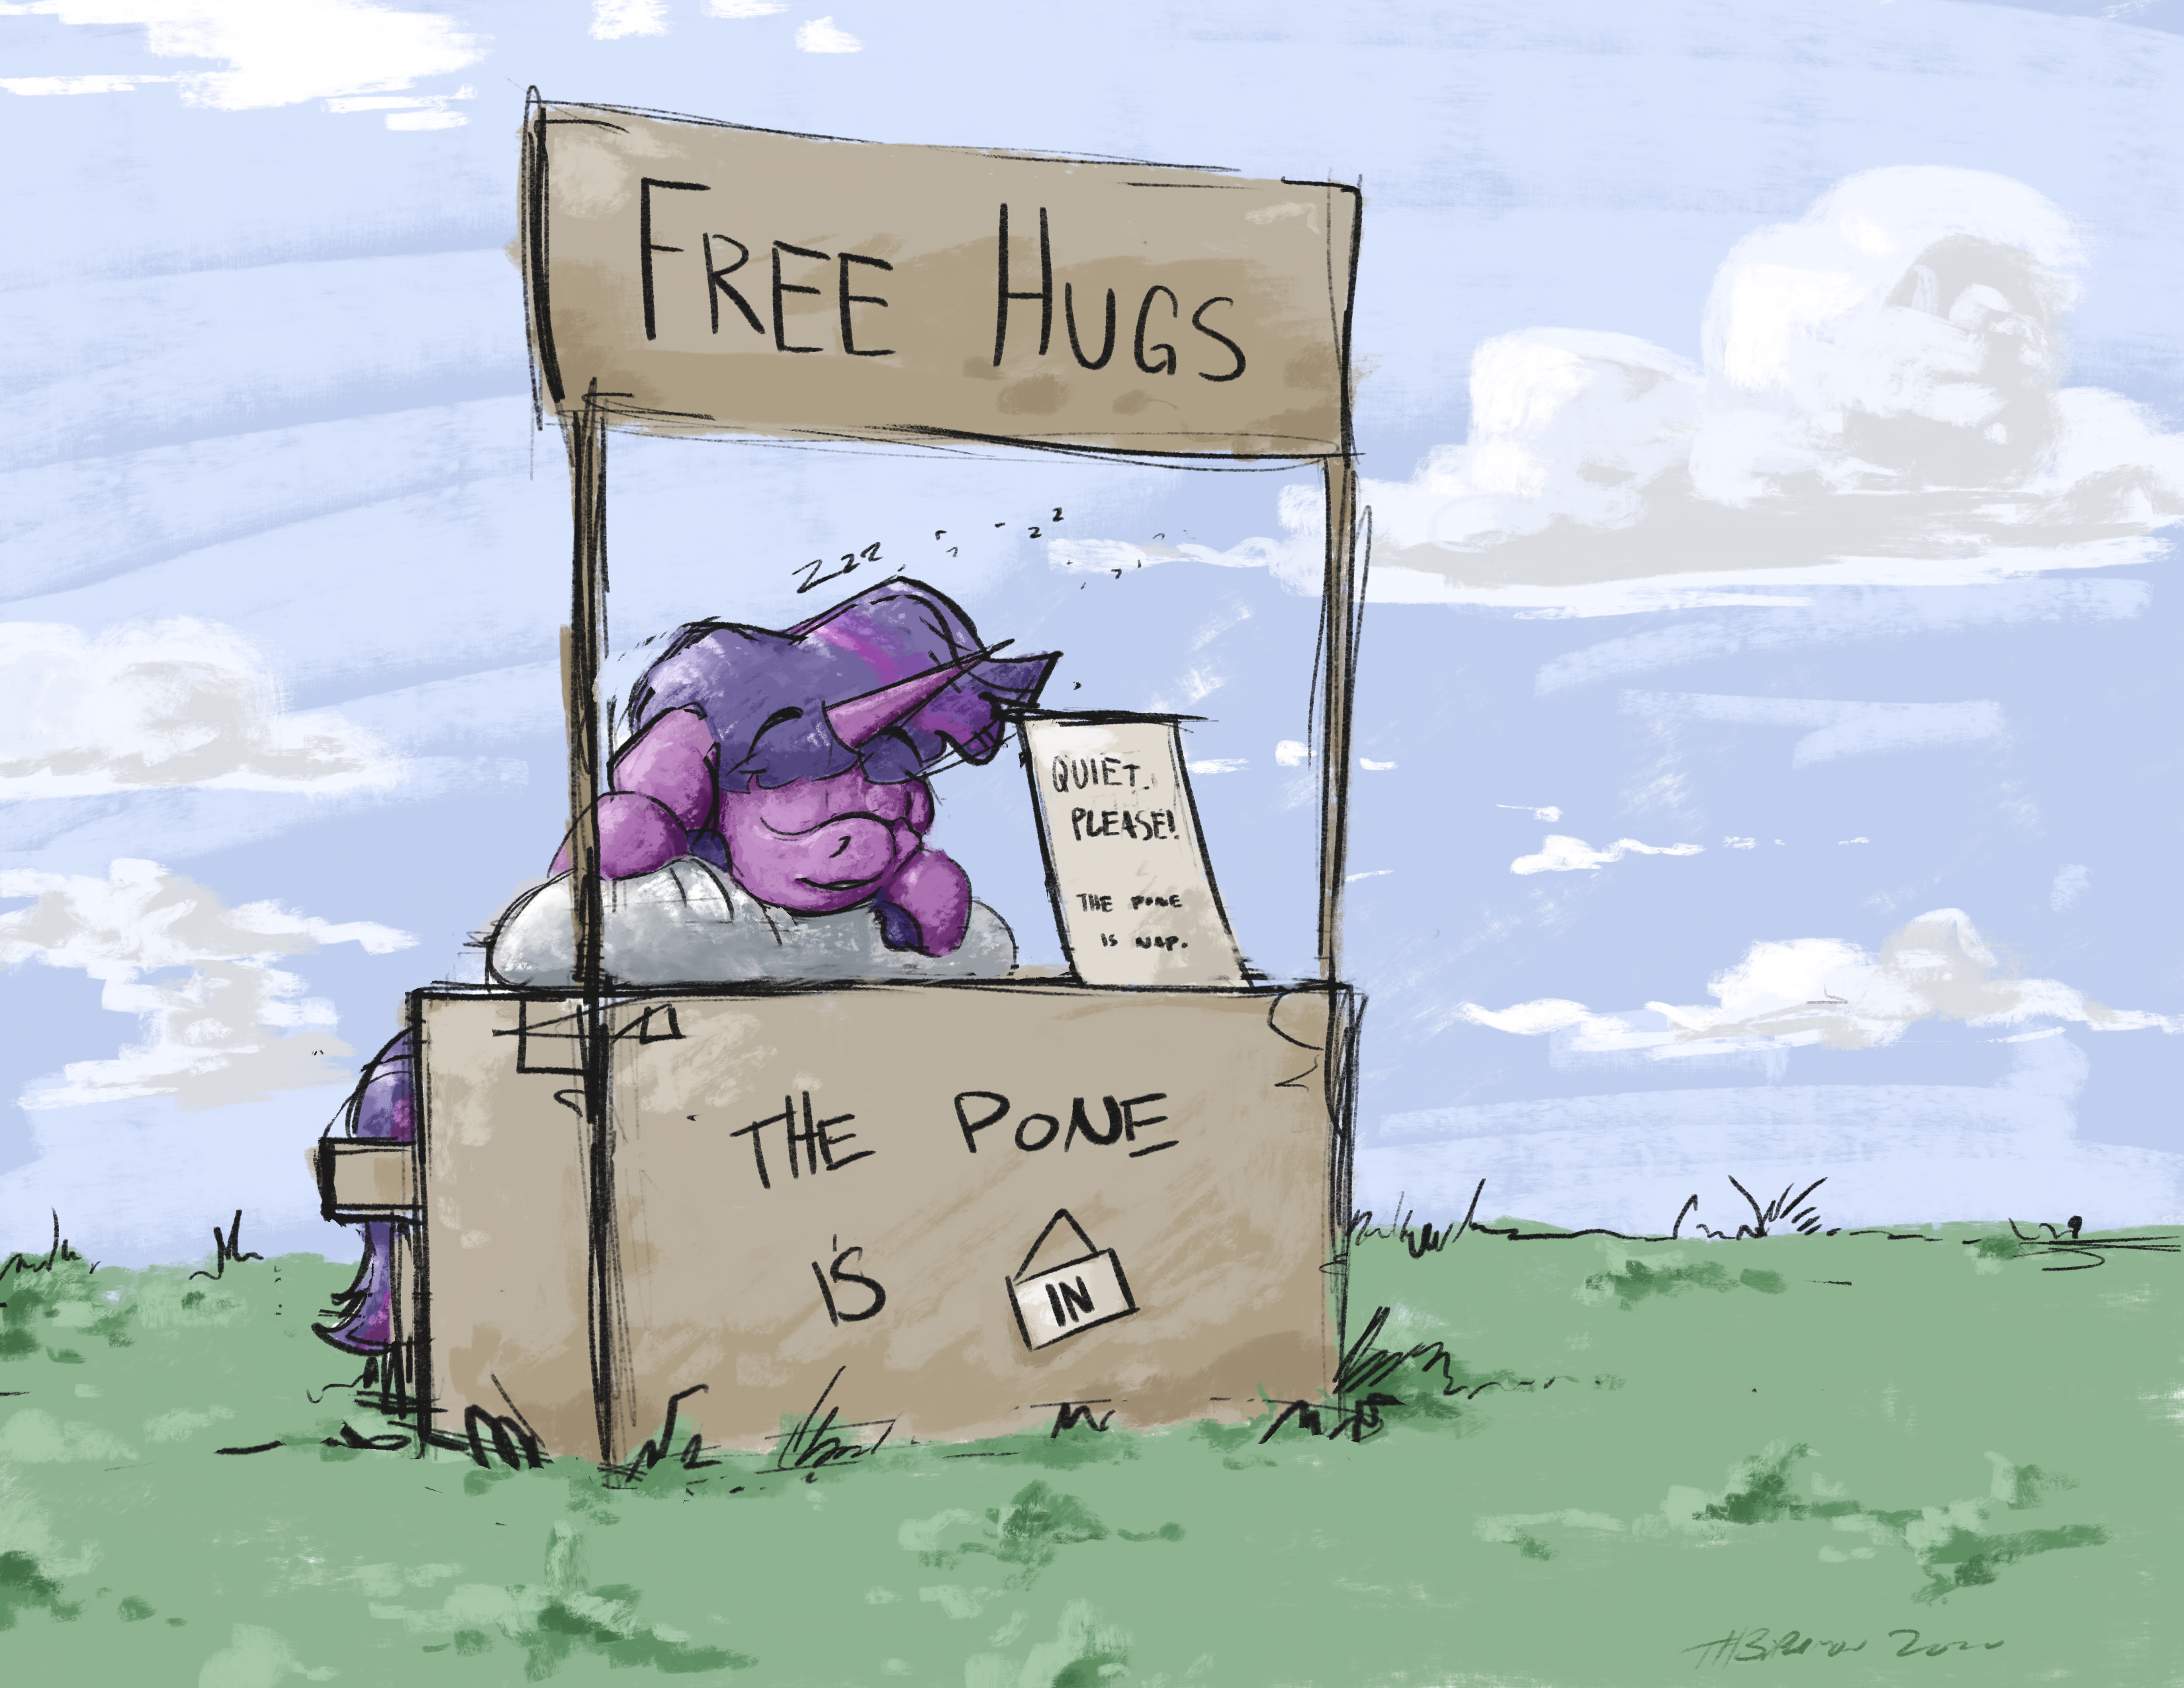 More Free Hugs